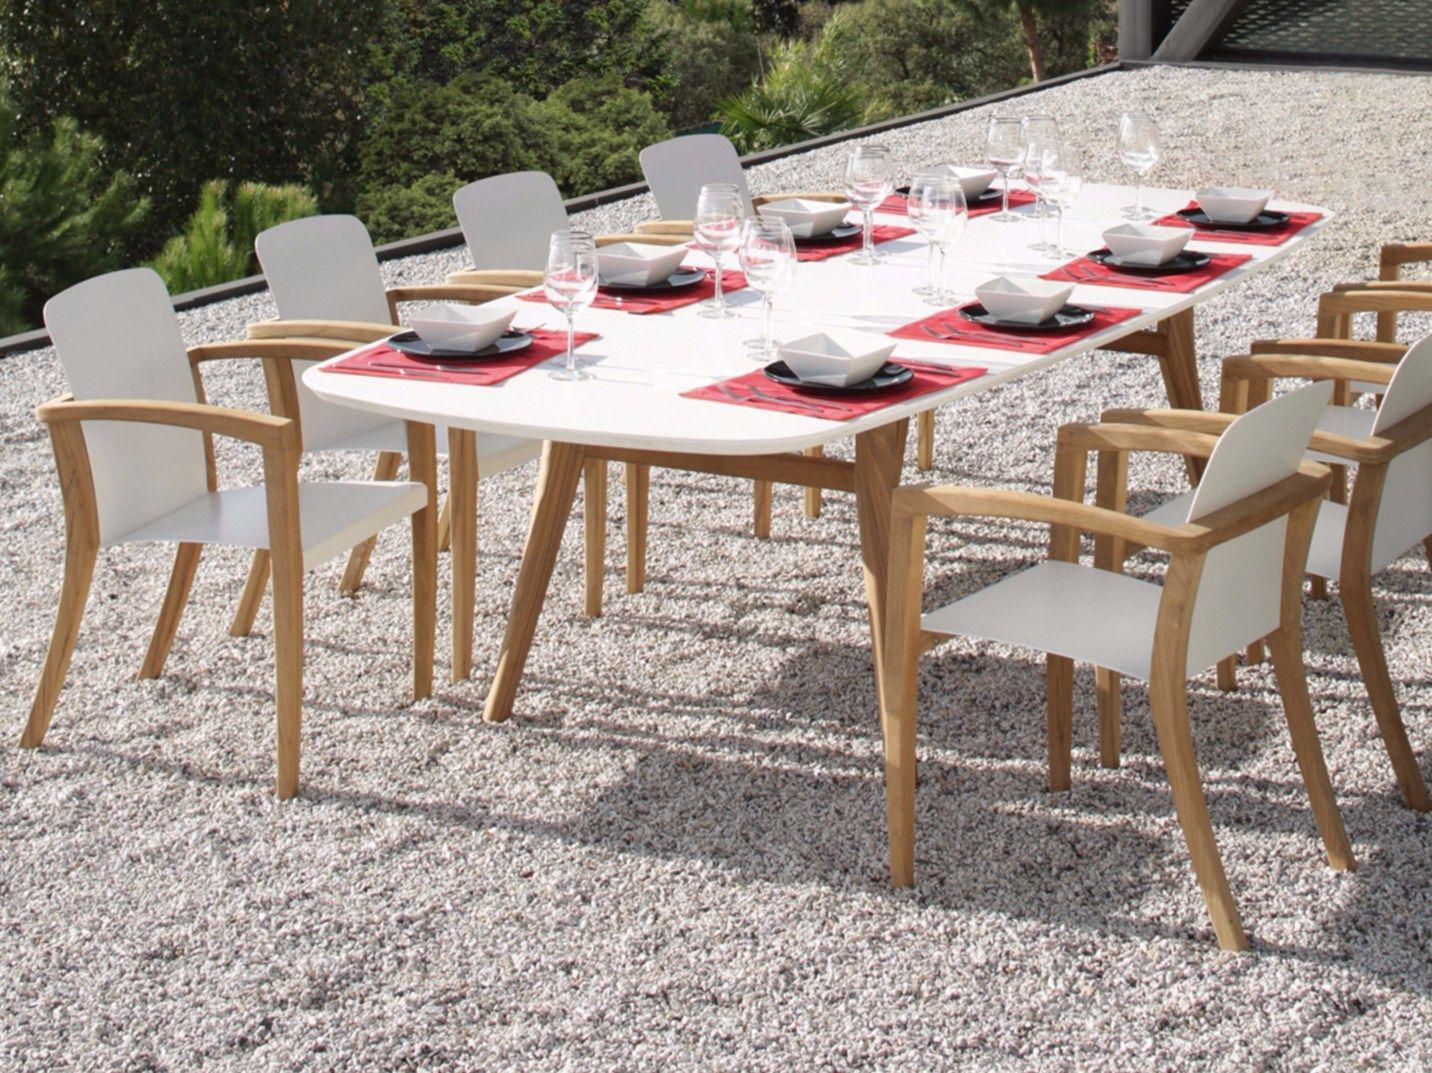 Zidiz tavolo rettangolare collezione zidiz by royal botania design ...